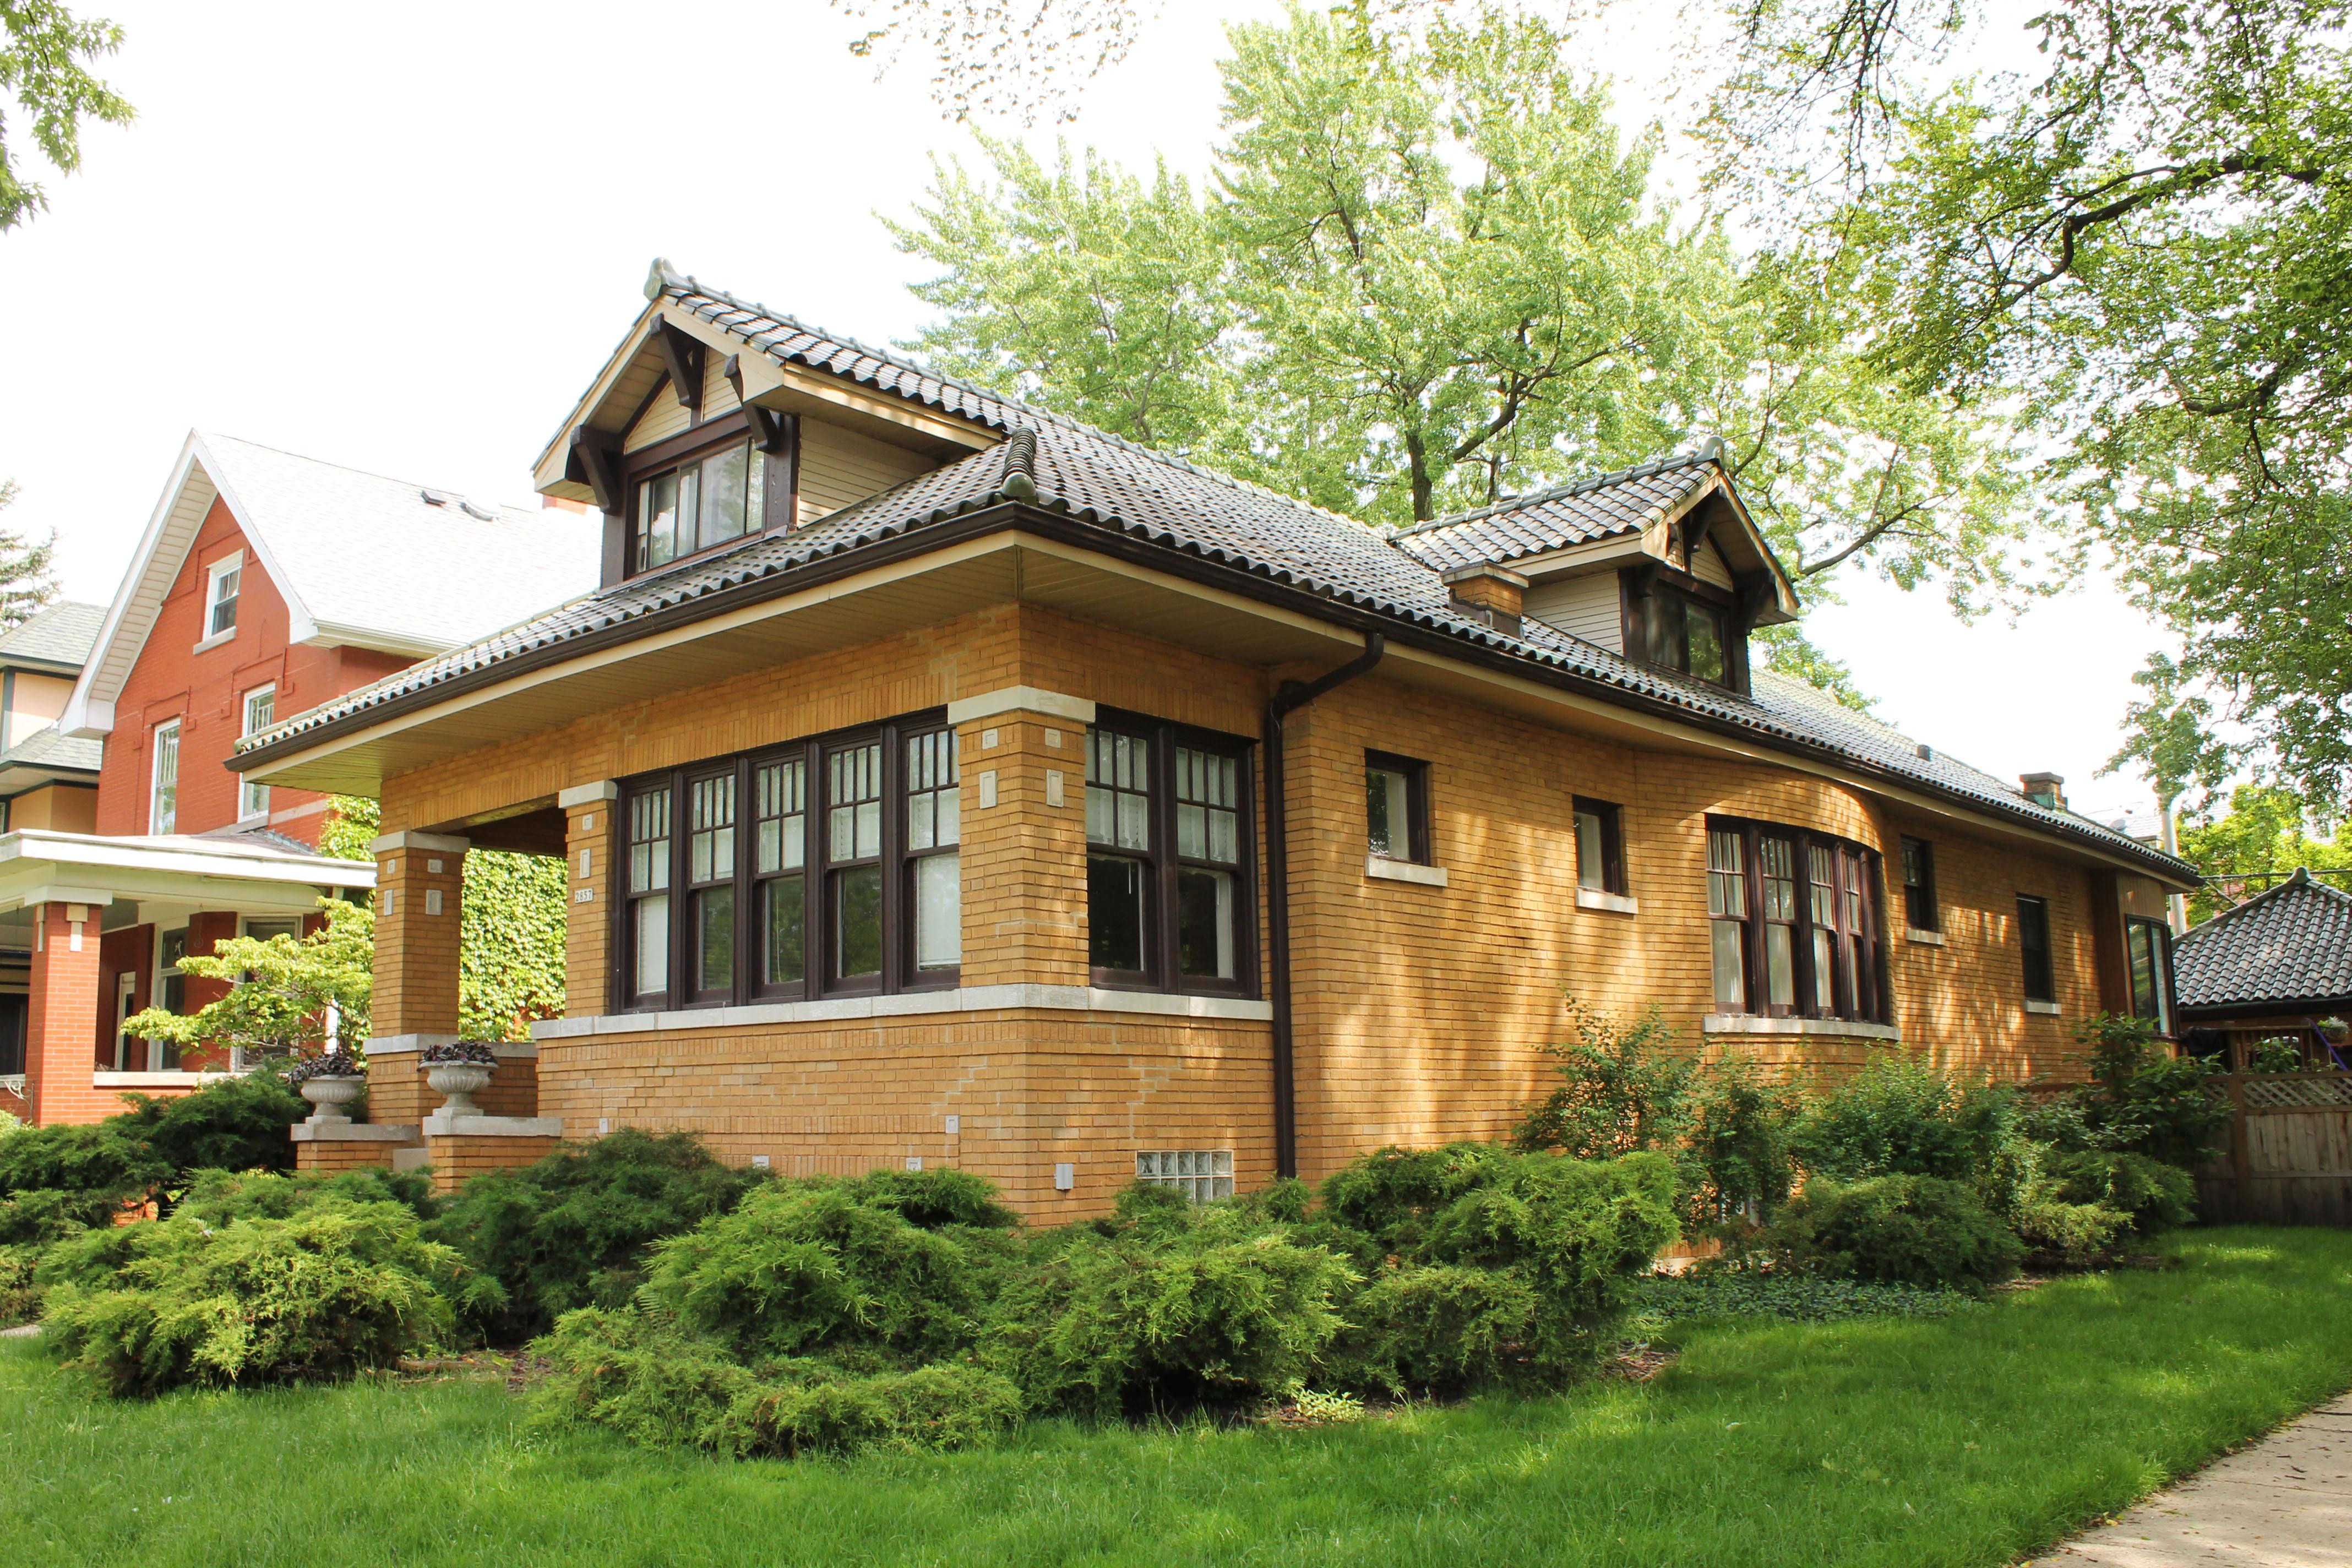 Chicago Bungalow Association | The Chicago Bungalow